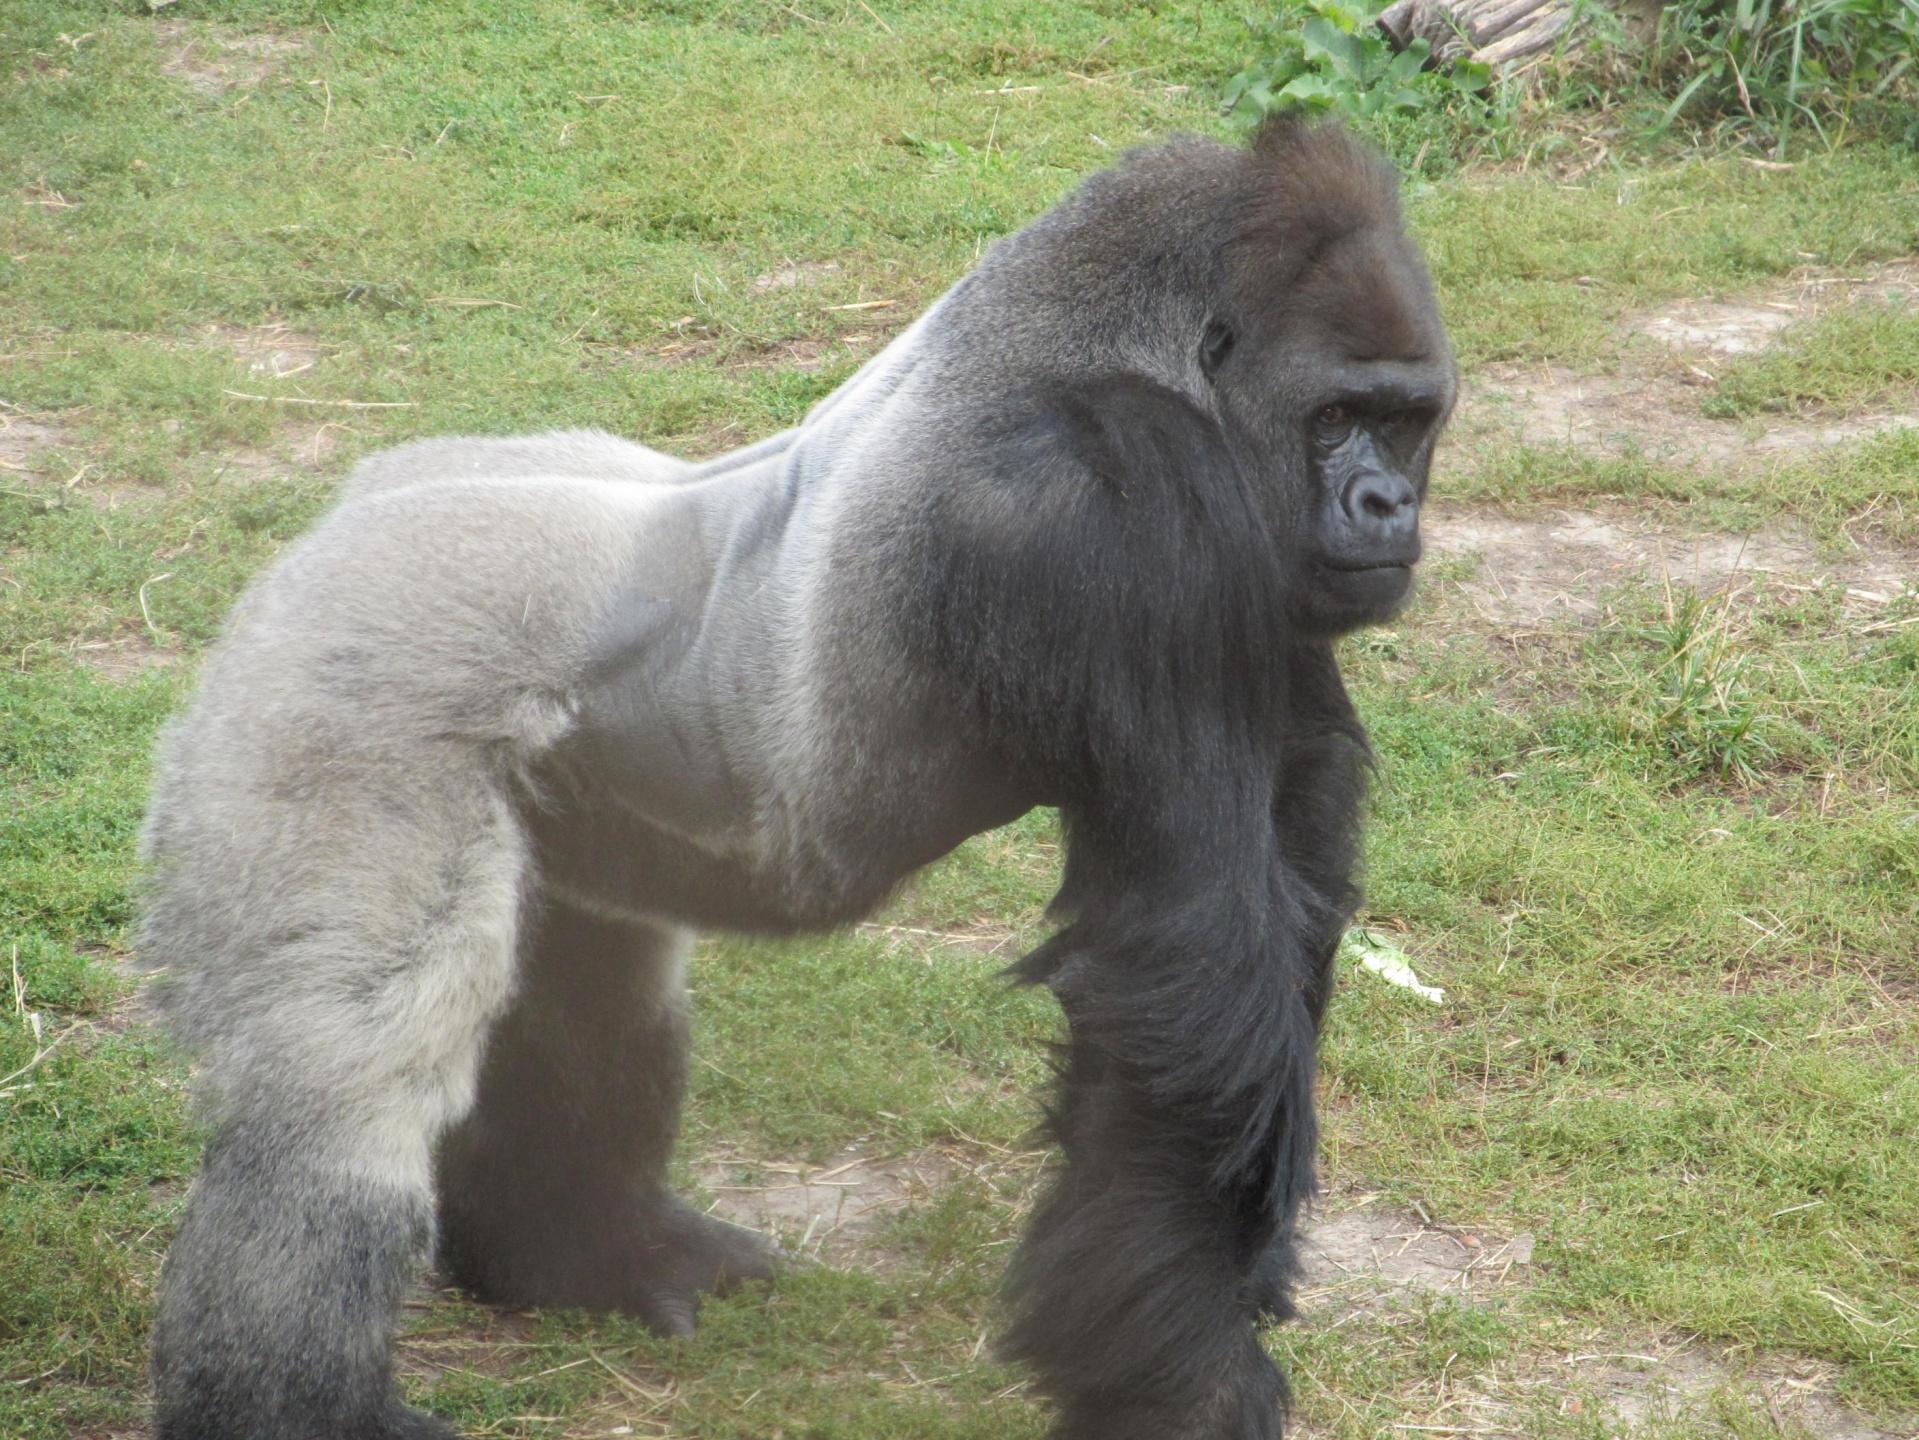 Silverback Gorilla Posing Free Stock Photo - Public Domain Pictures